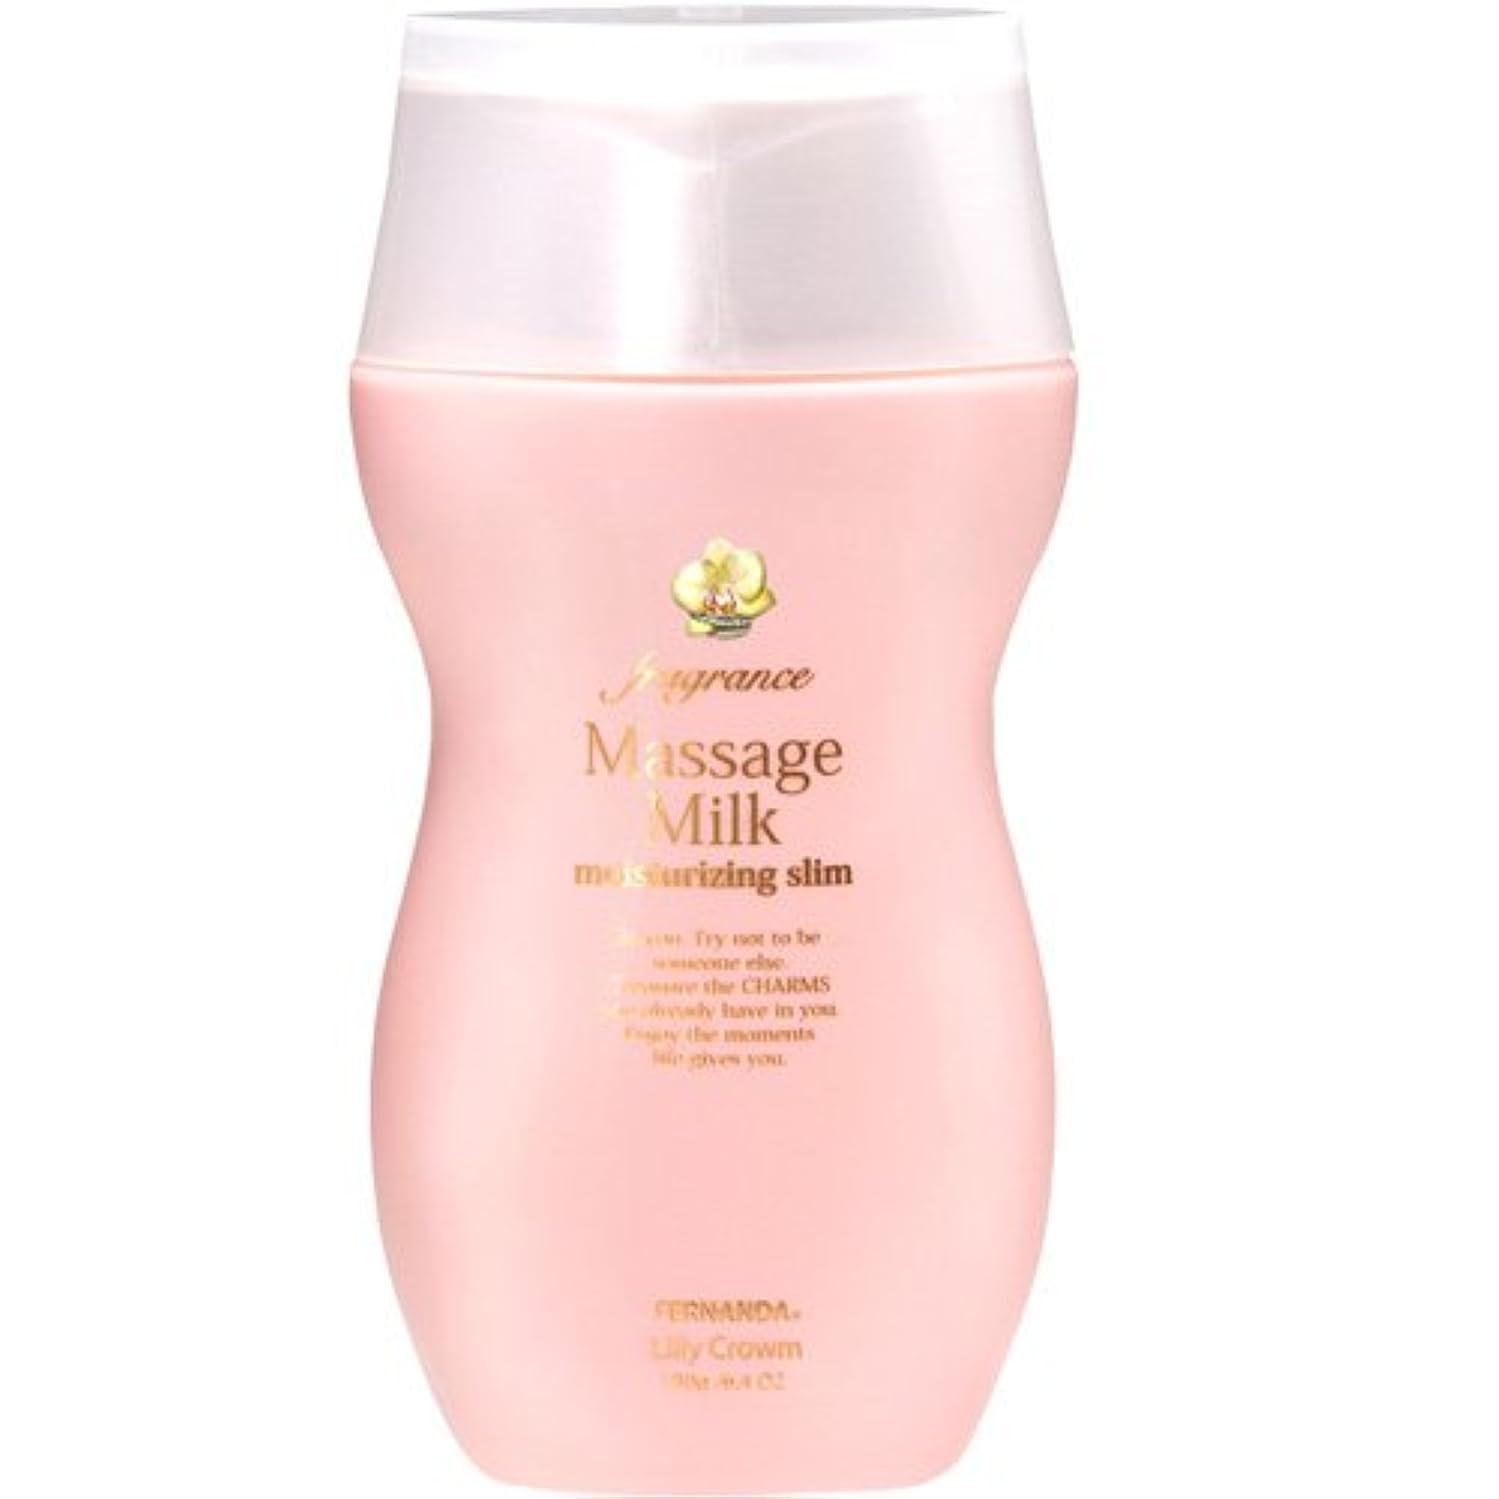 FERNANDA(フェルナンダ) Massage Milk Lilly Crown (マッサージミルク リリークラウン)